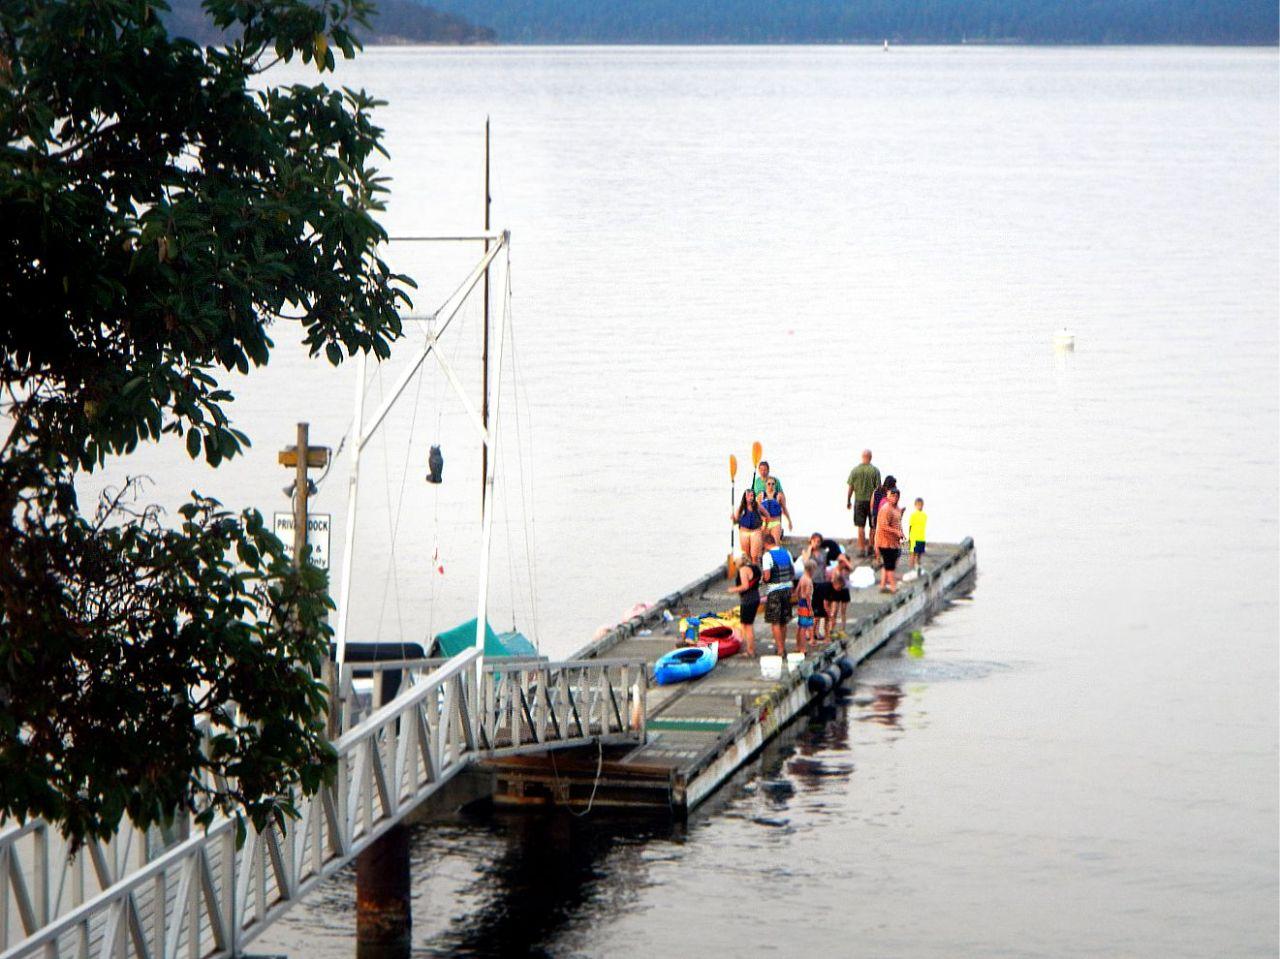 Busy dock